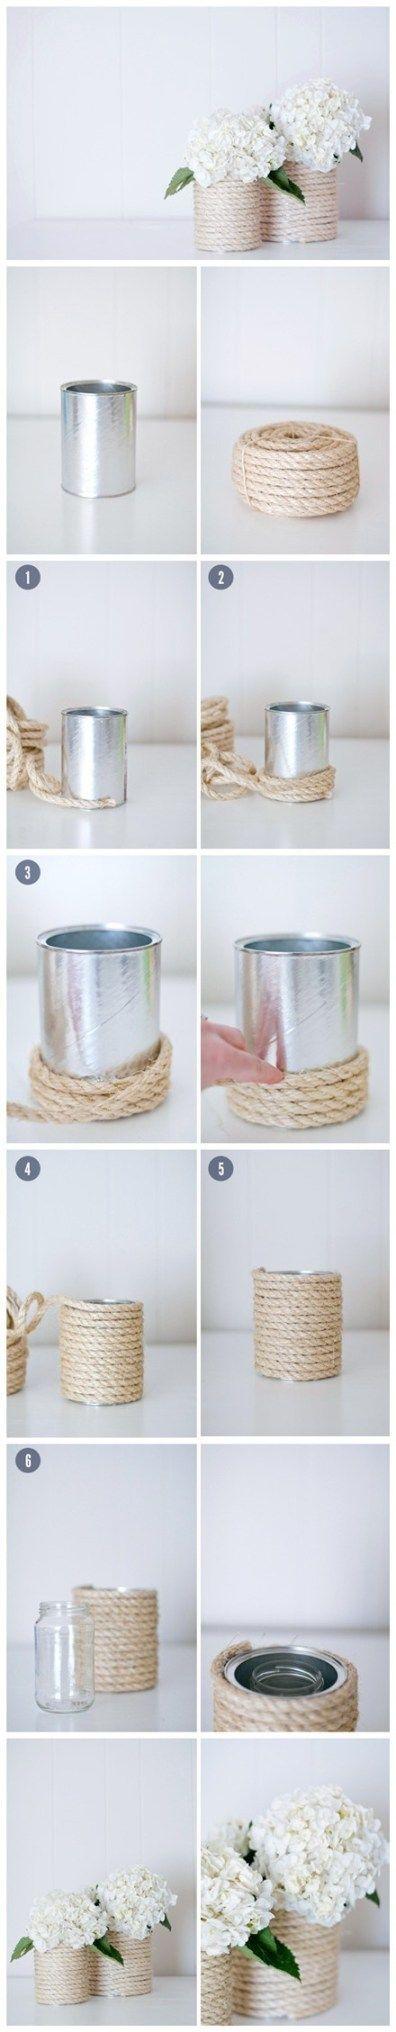 Tin Can Rope DIY Vases #craft #vase #flowers